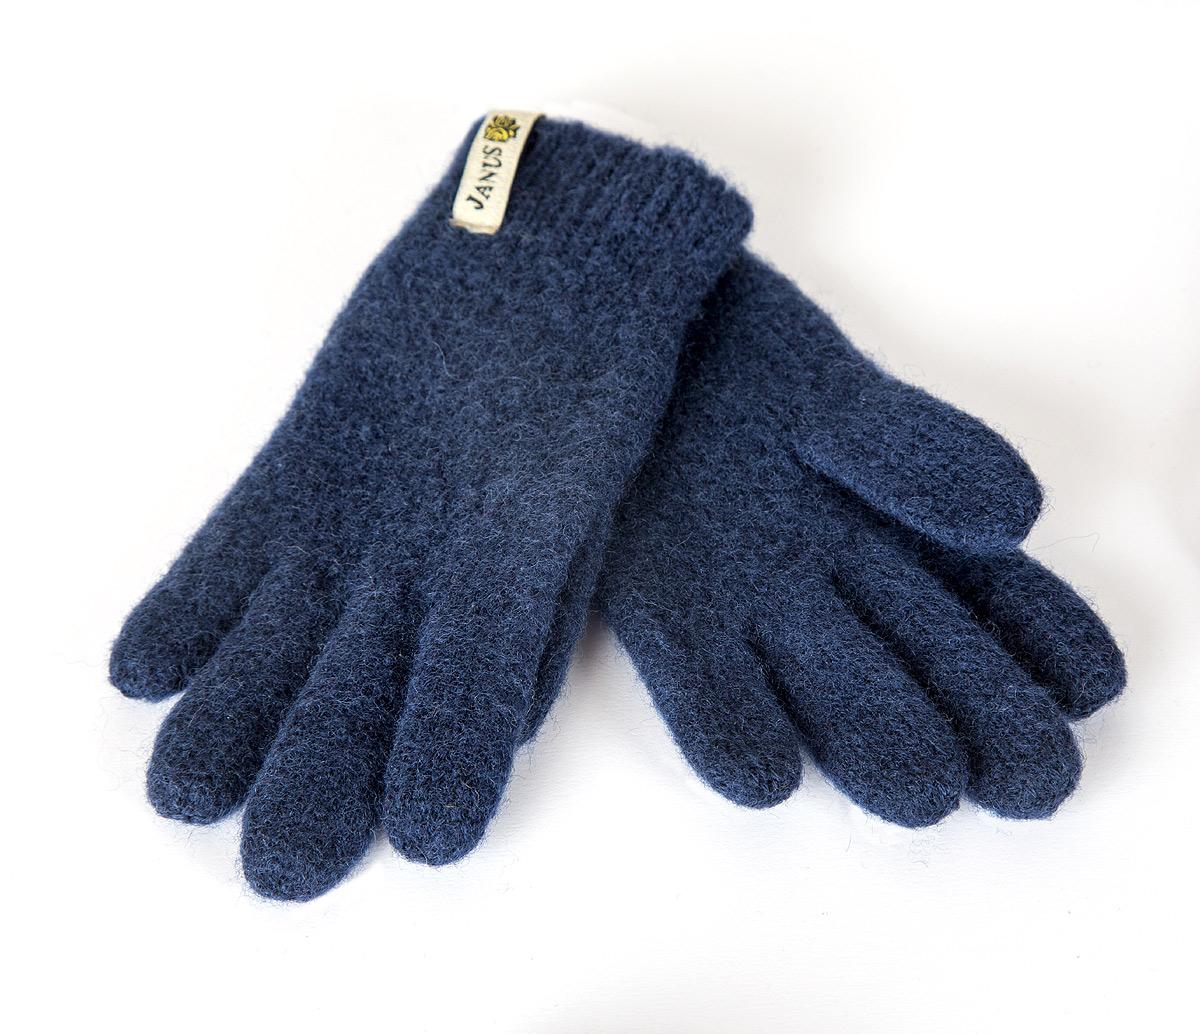 Janus barn fingervante ruggad merinoull mörkblå